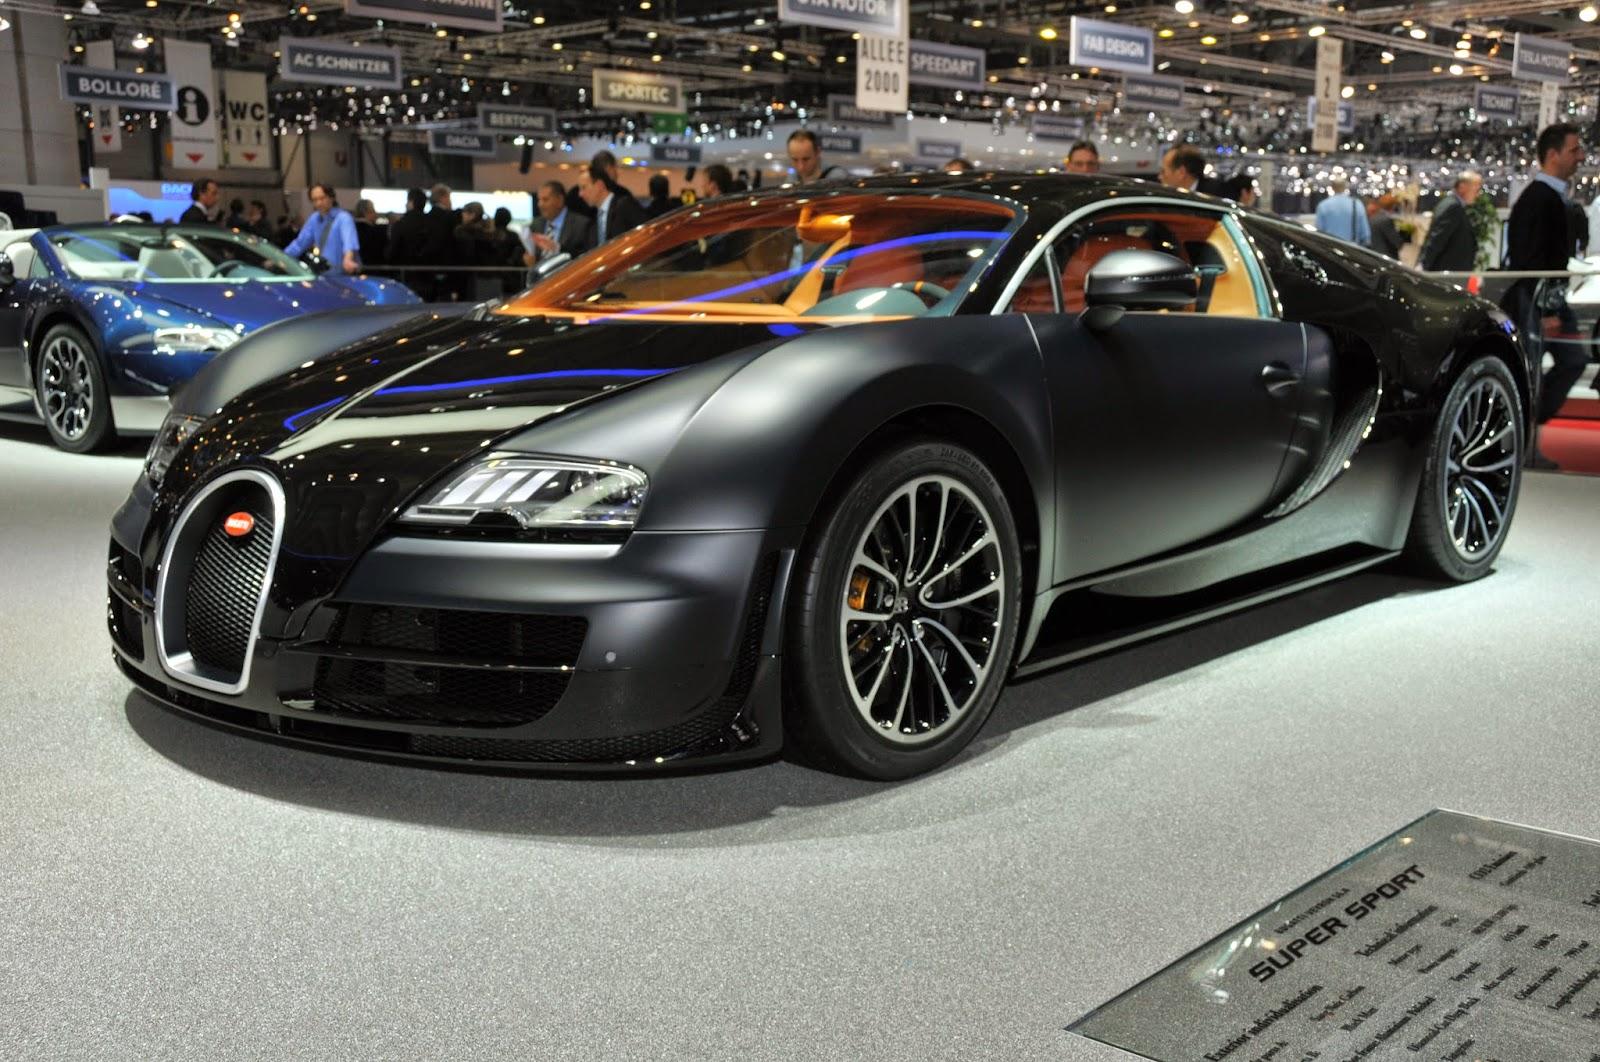 Bugatti Super Veyron Front View Image